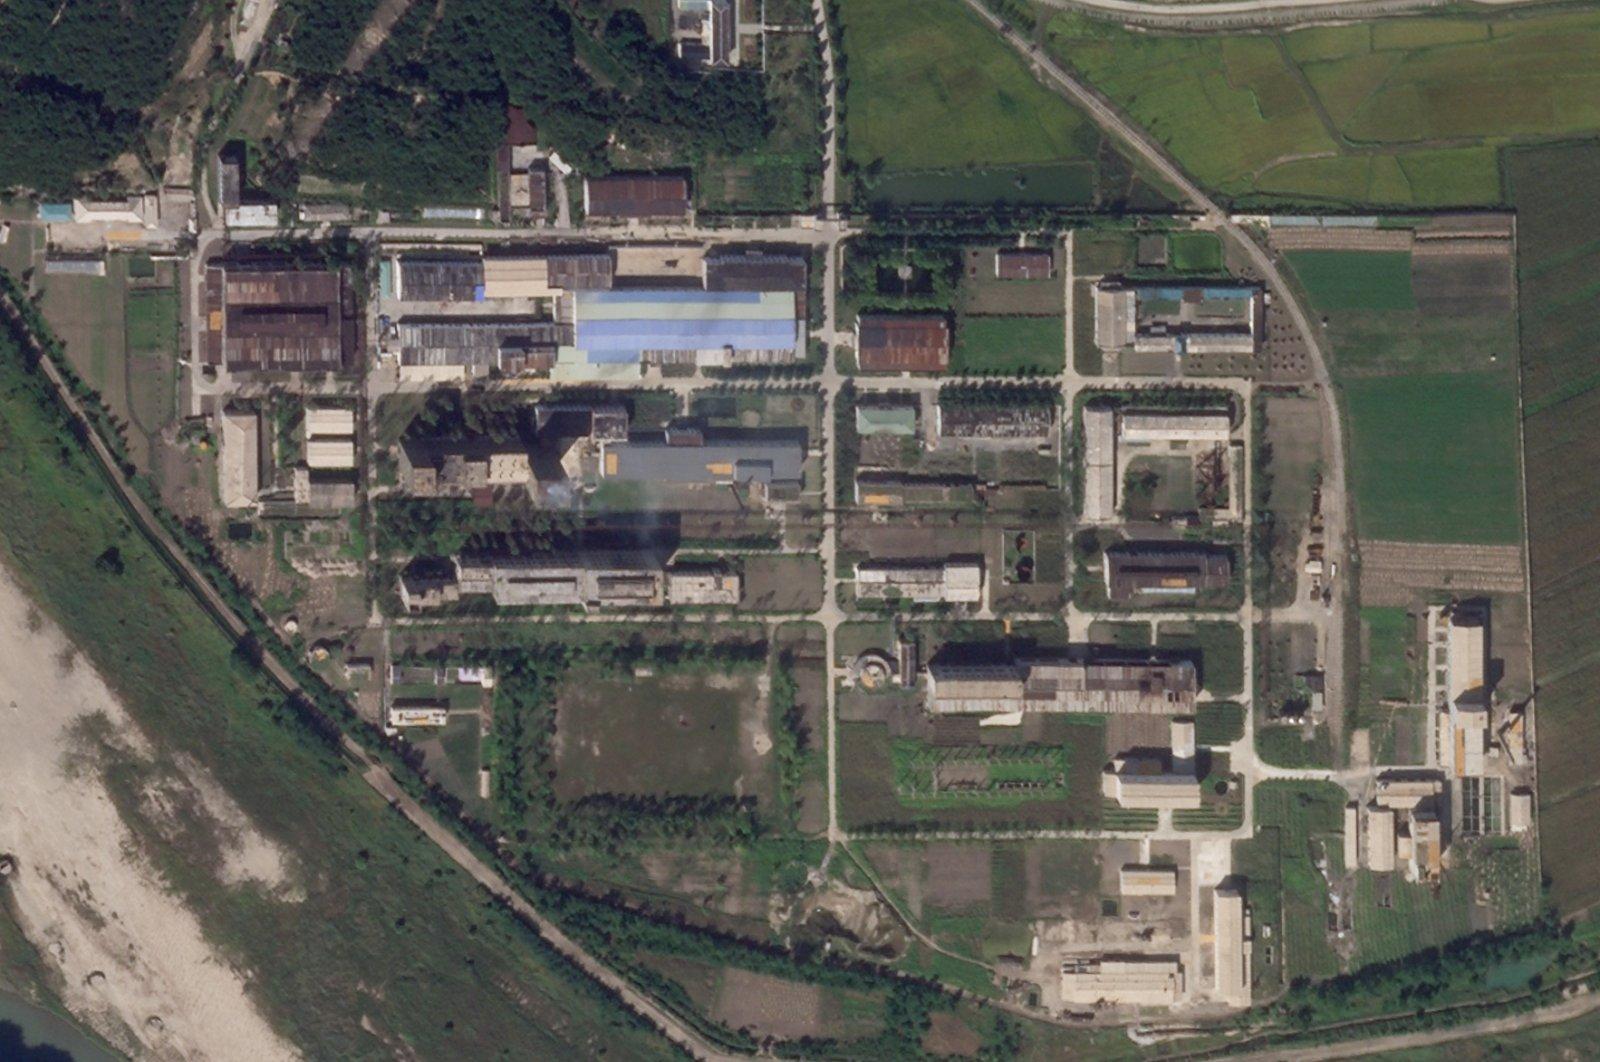 A uranium enrichment plant is seen at North Korea's main Yongbyon nuclear complex, Sept. 18, 2021. (Planet Labs Inc. via AP)